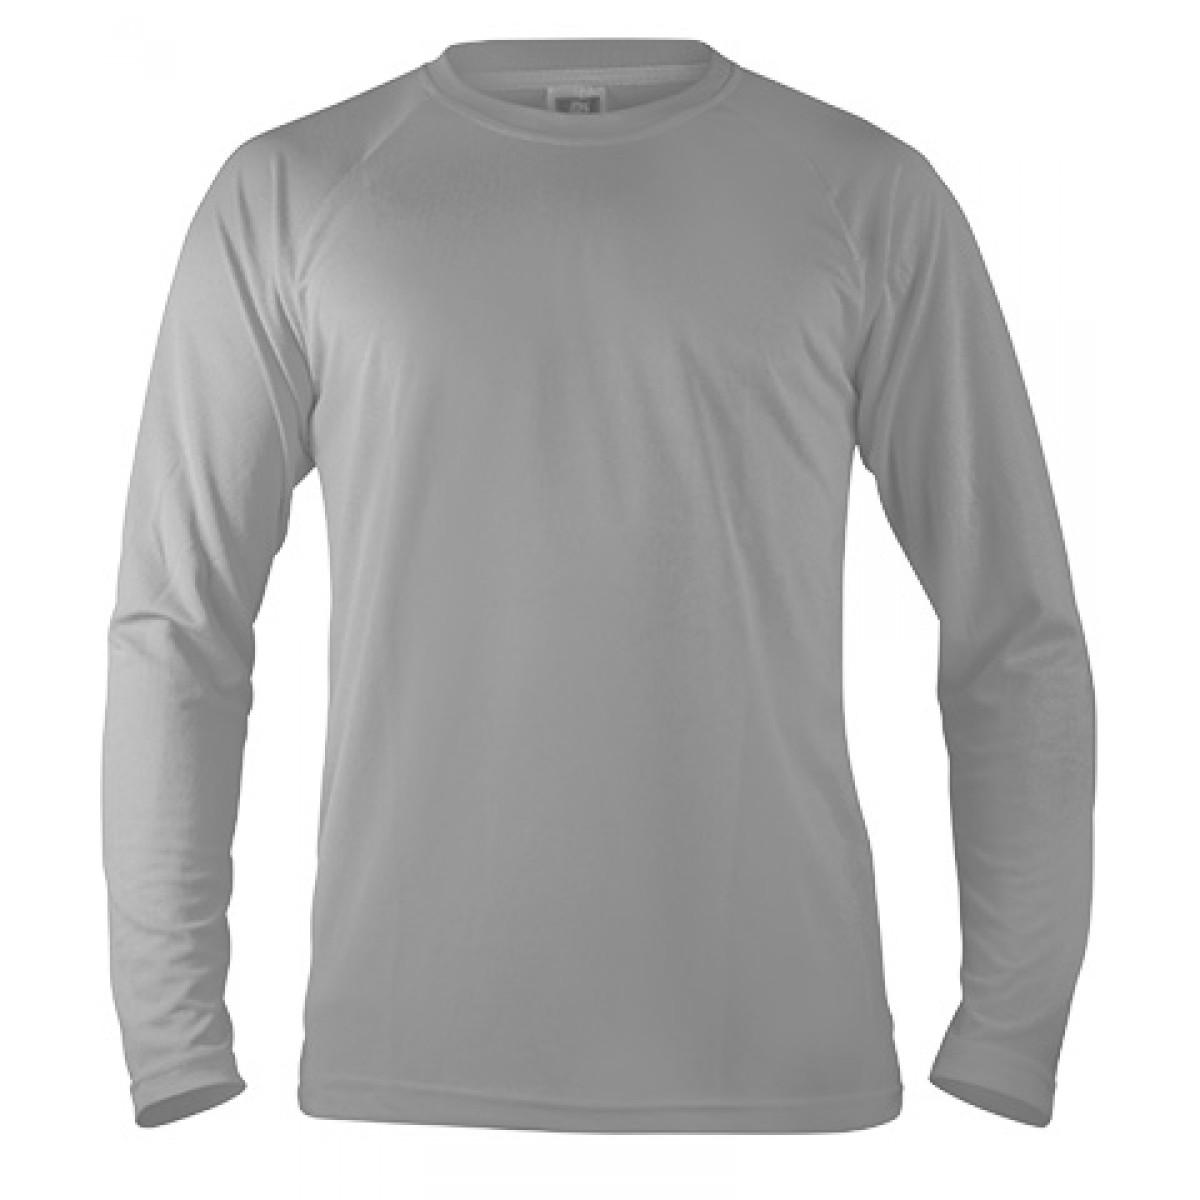 Long Sleeve Performance -Gray -XL